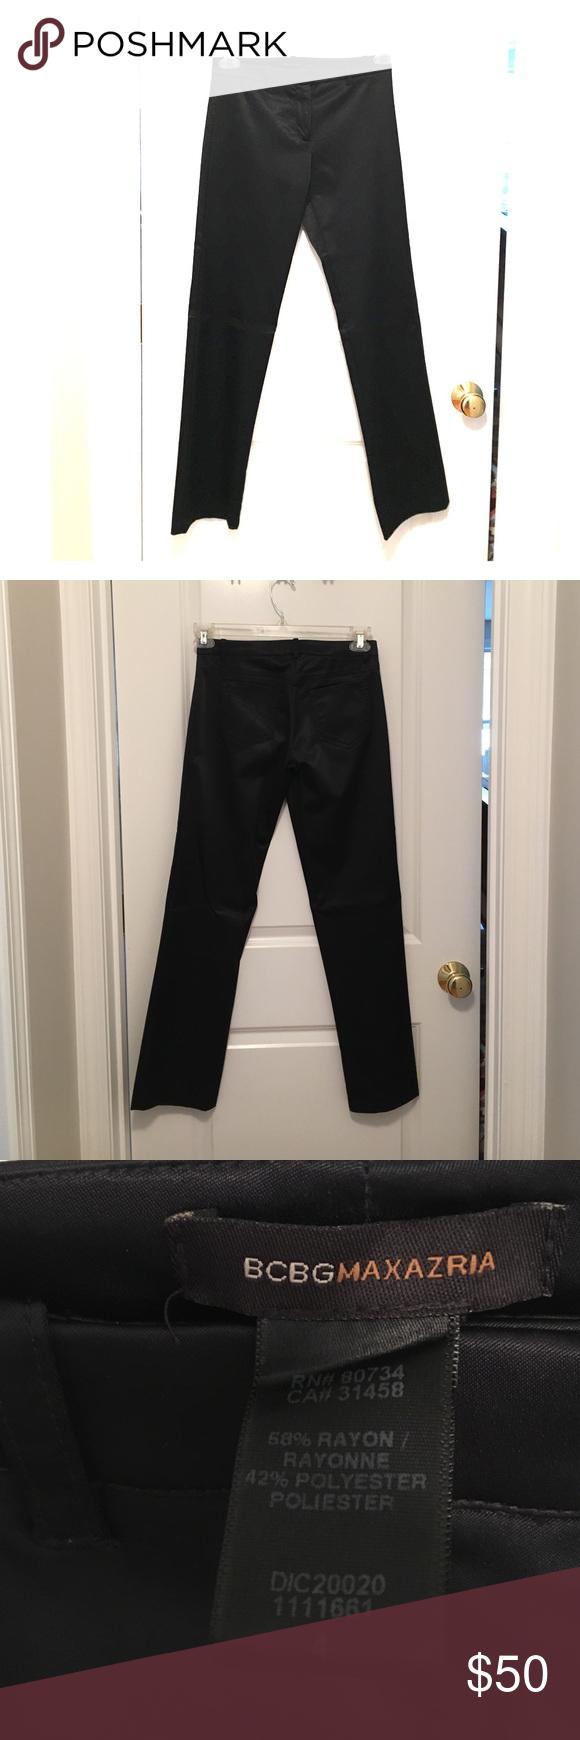 BCBG Black Shean Straight Leg Pants BCBG black Shean straight leg dress pants. Size 4. Has 2 back pockets, belt loop, no front pockets. Worn once. Perfect for a night out. BCBG Pants Straight Leg